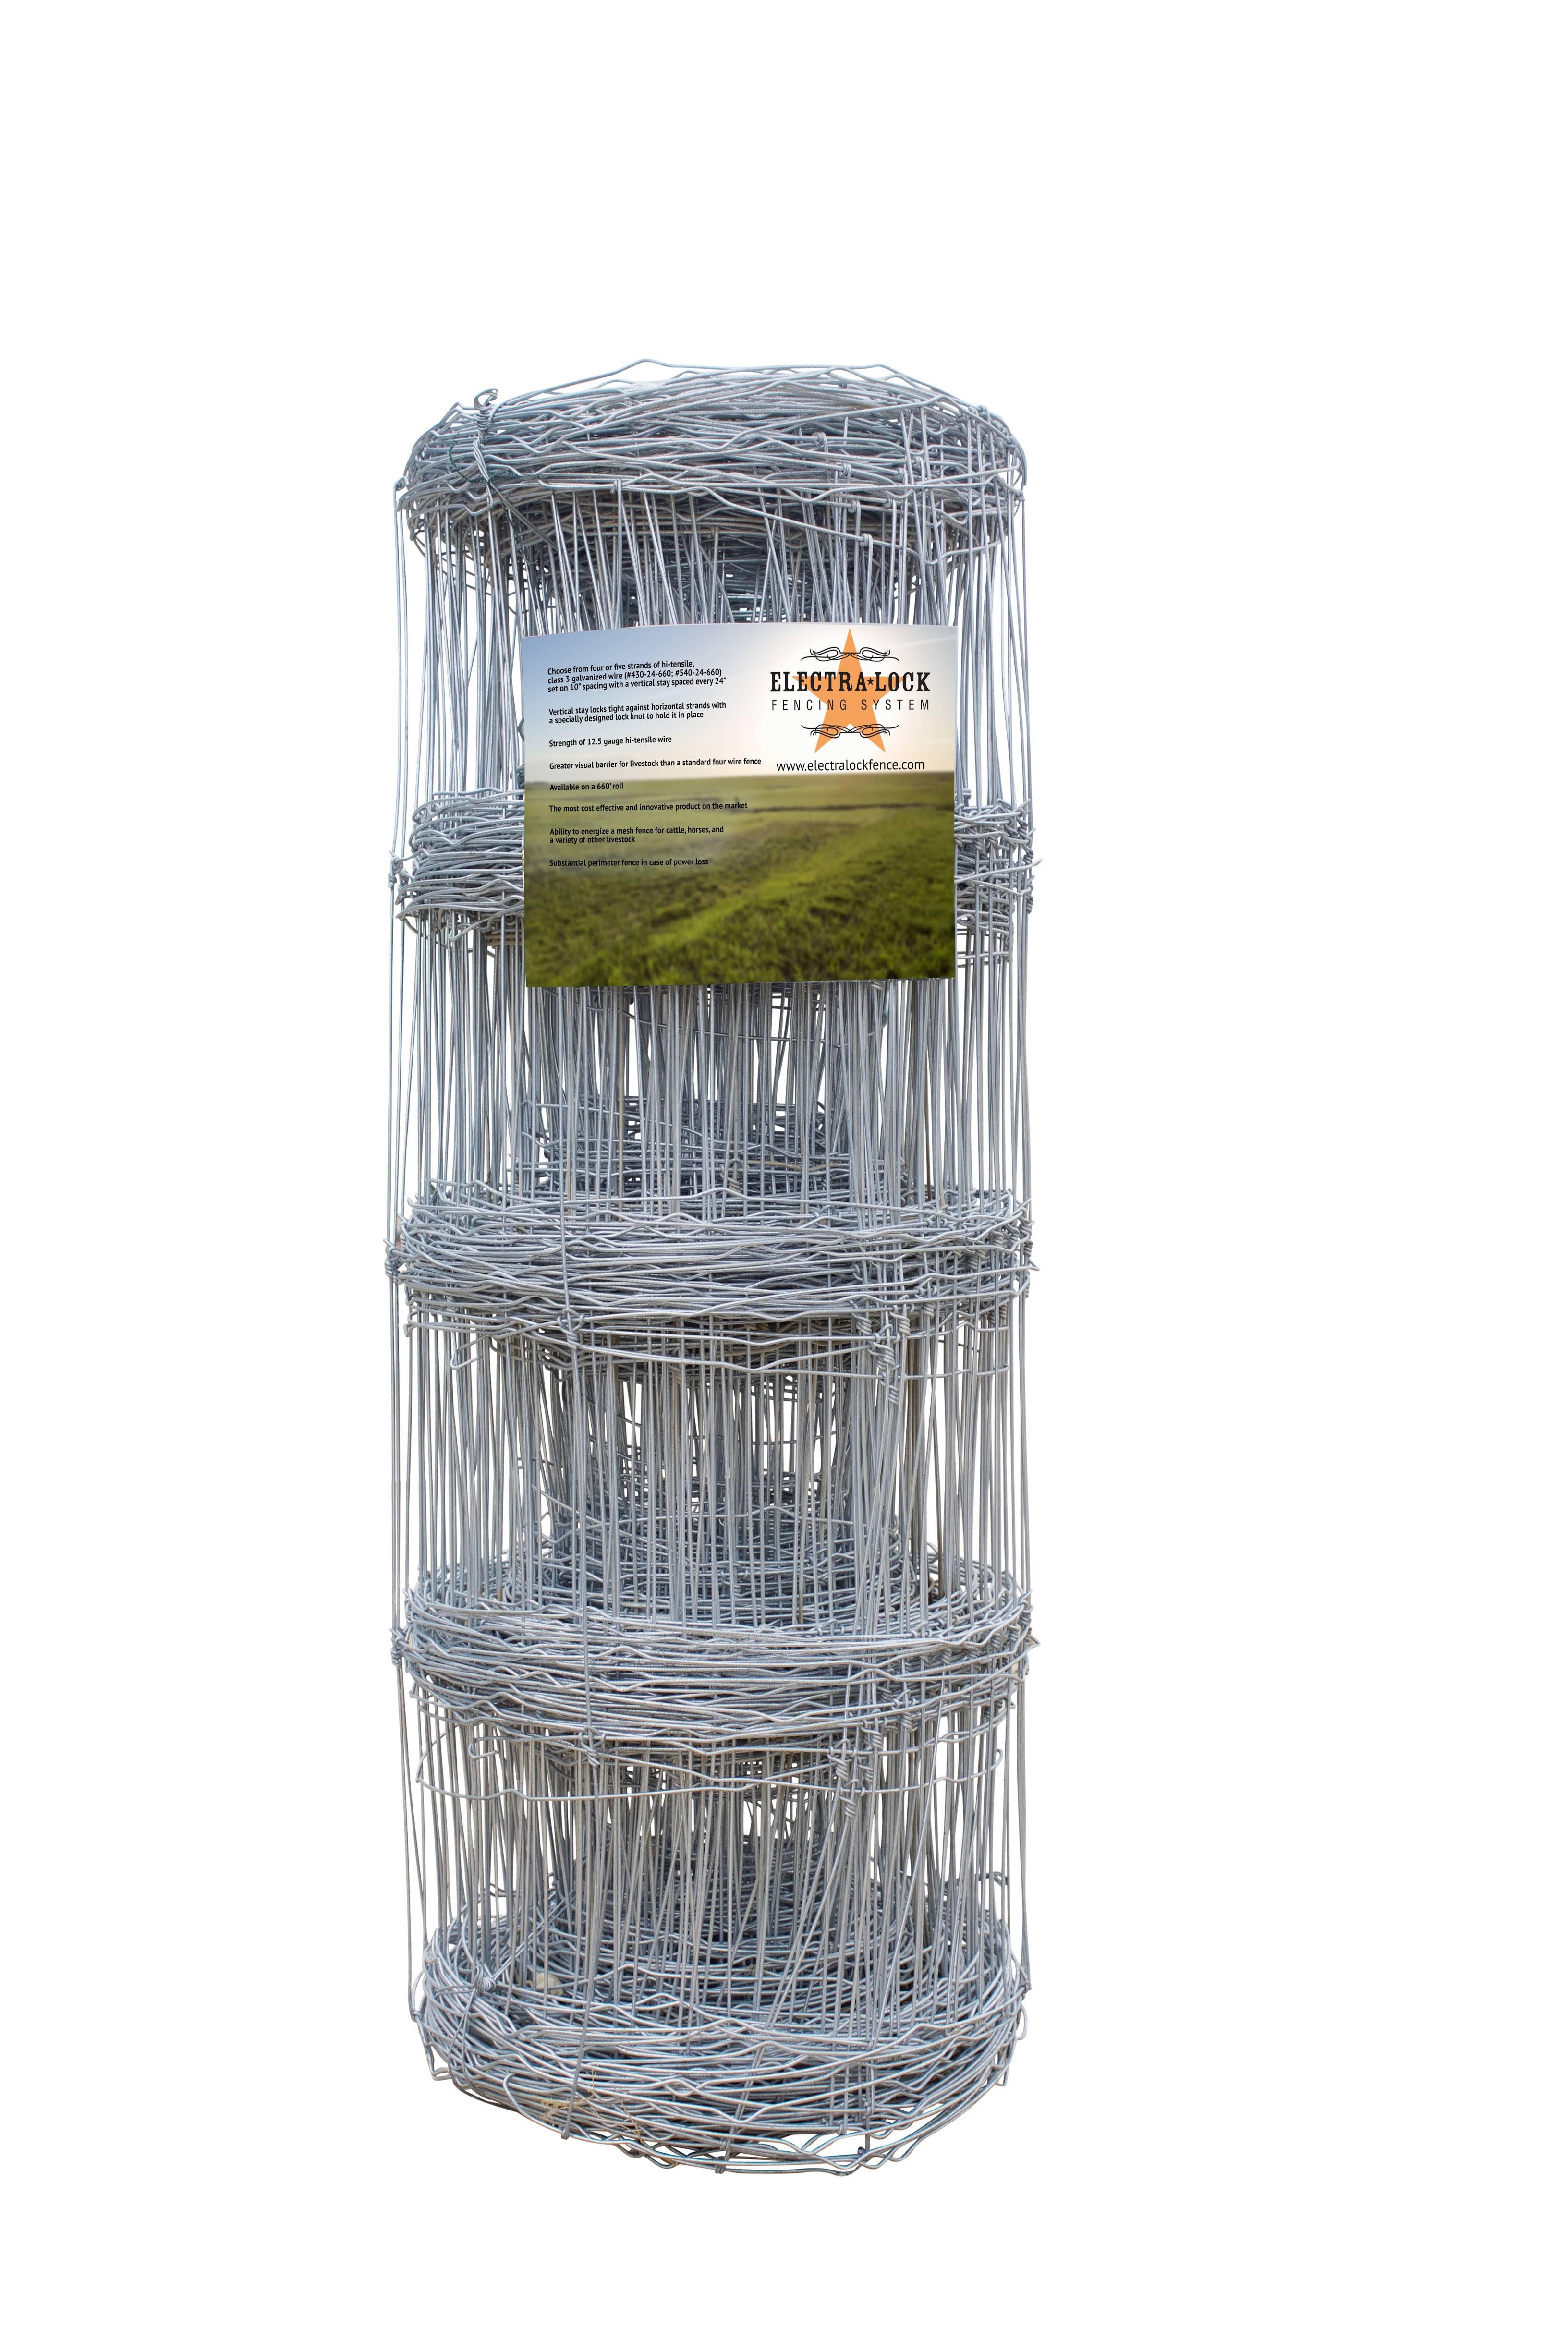 5-Strand Electra-Lock Fence Wire